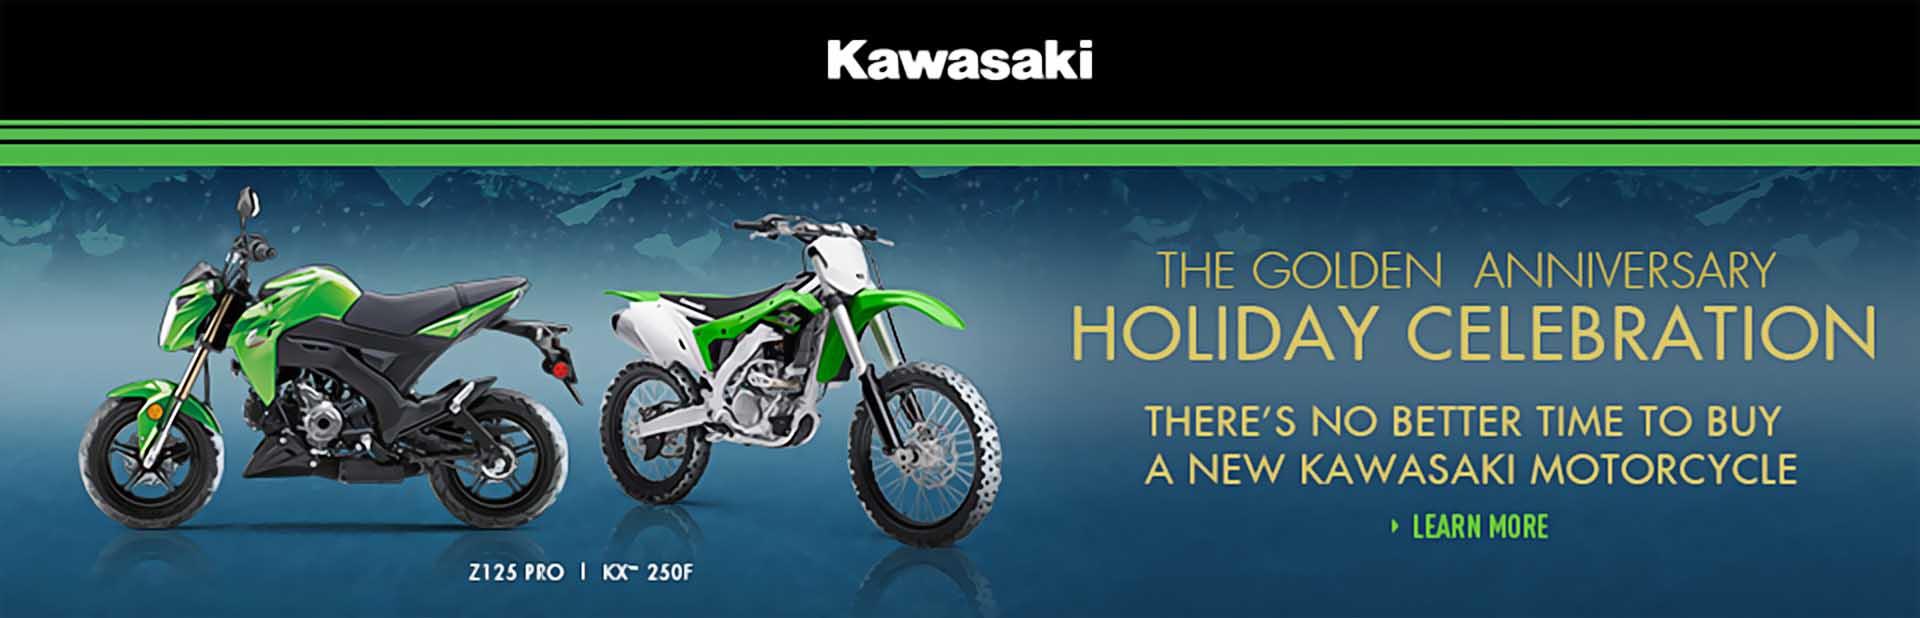 Kawasaki Golden Anniversary Holiday Celebration - Two Wheel